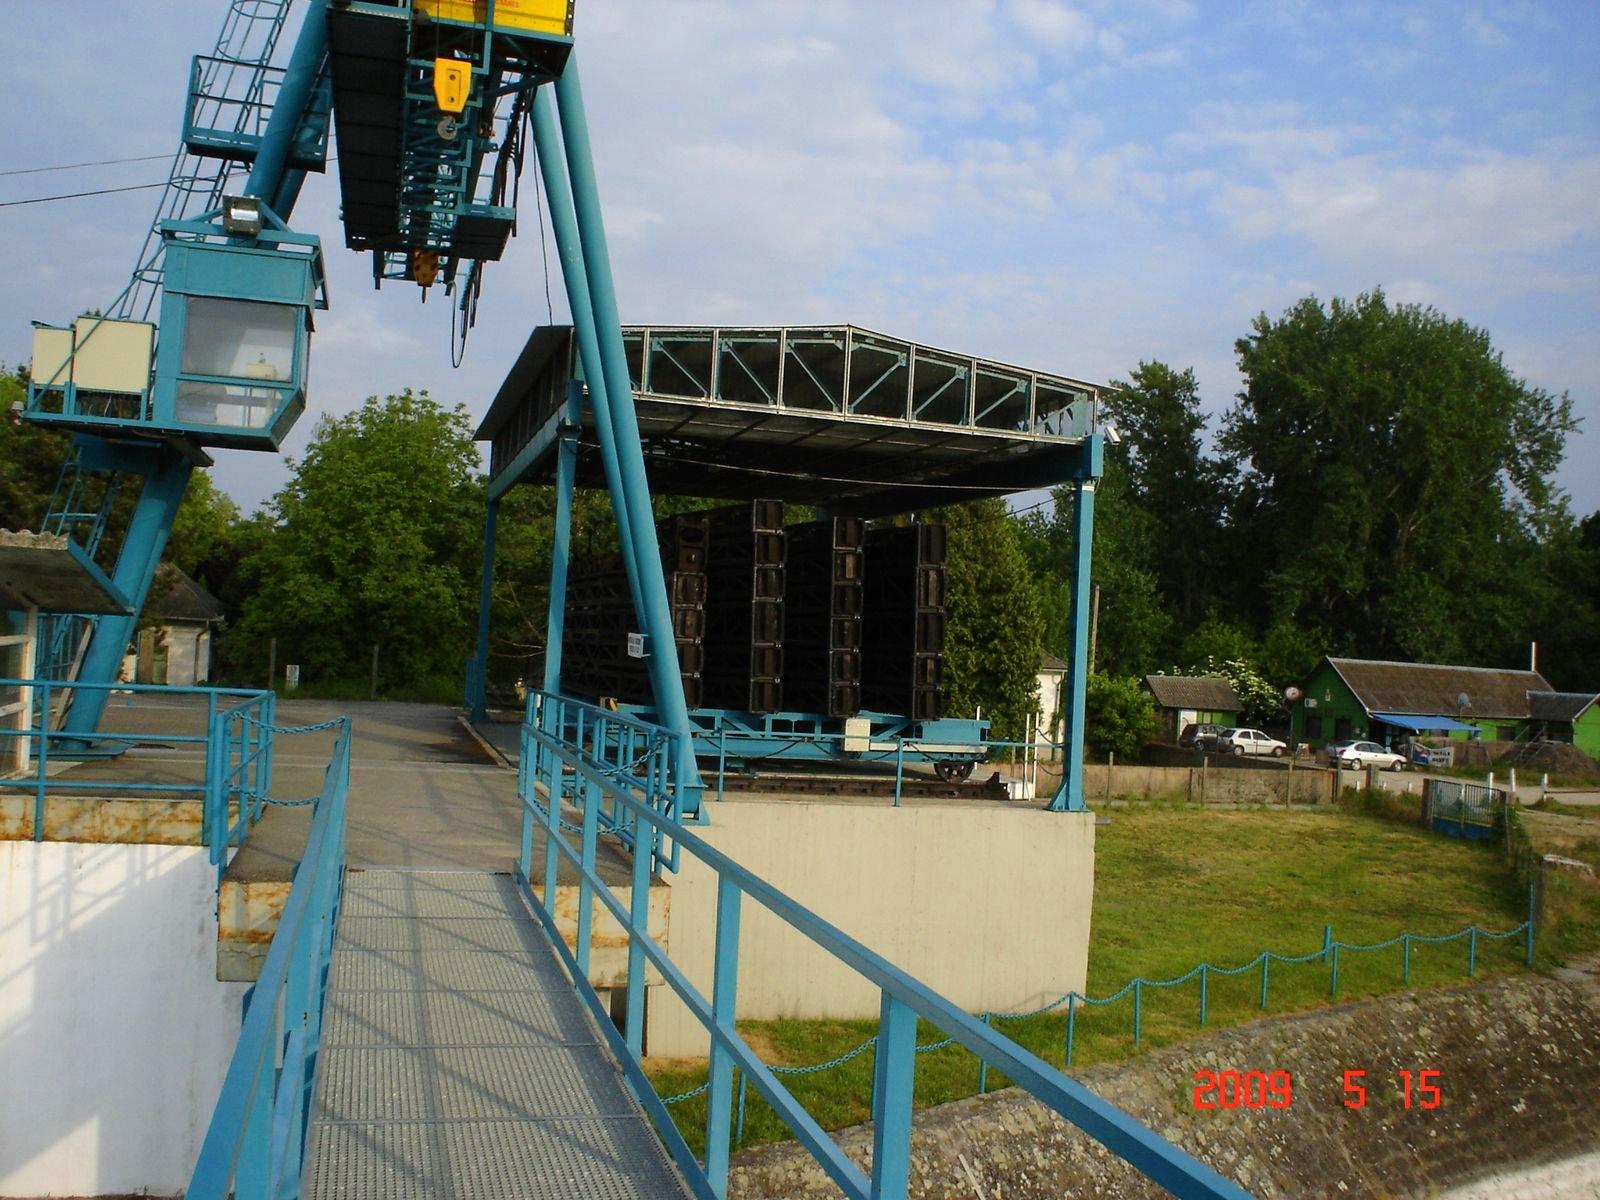 http://www.kisdunainagyhajok.hu/kis-dunai_zsilipek/tassi-zsilip/tassi-zsilip_037.jpg